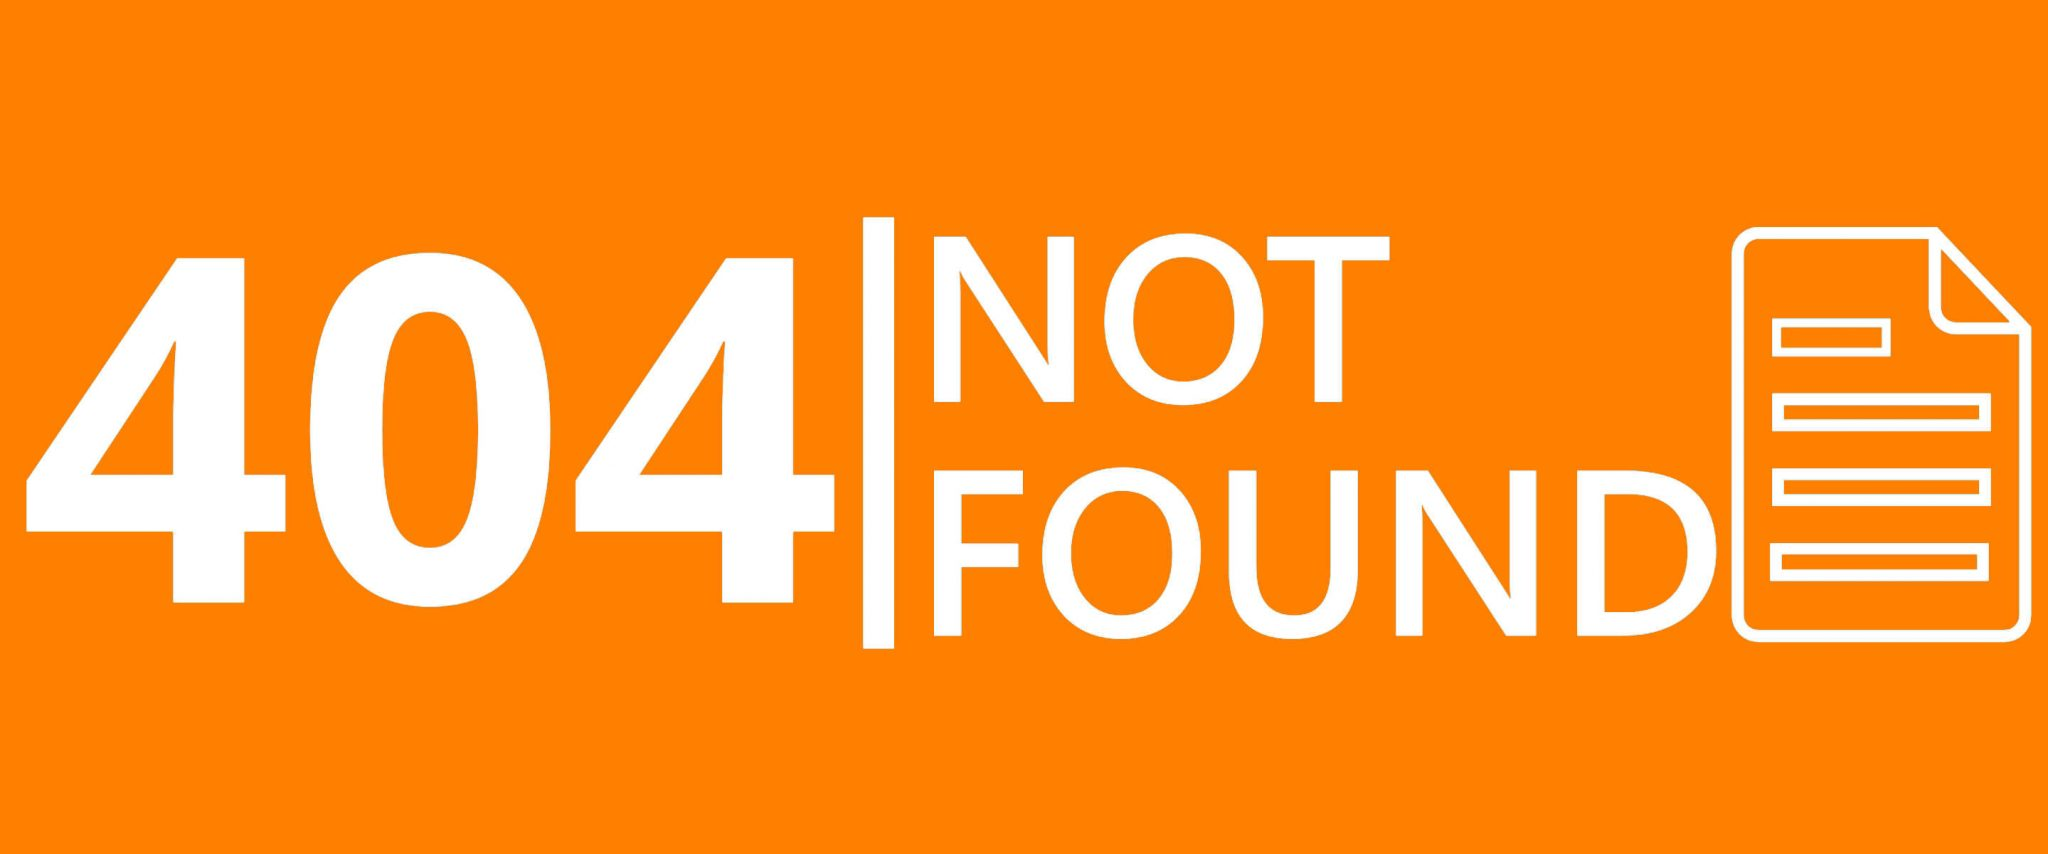 404 error Shopware